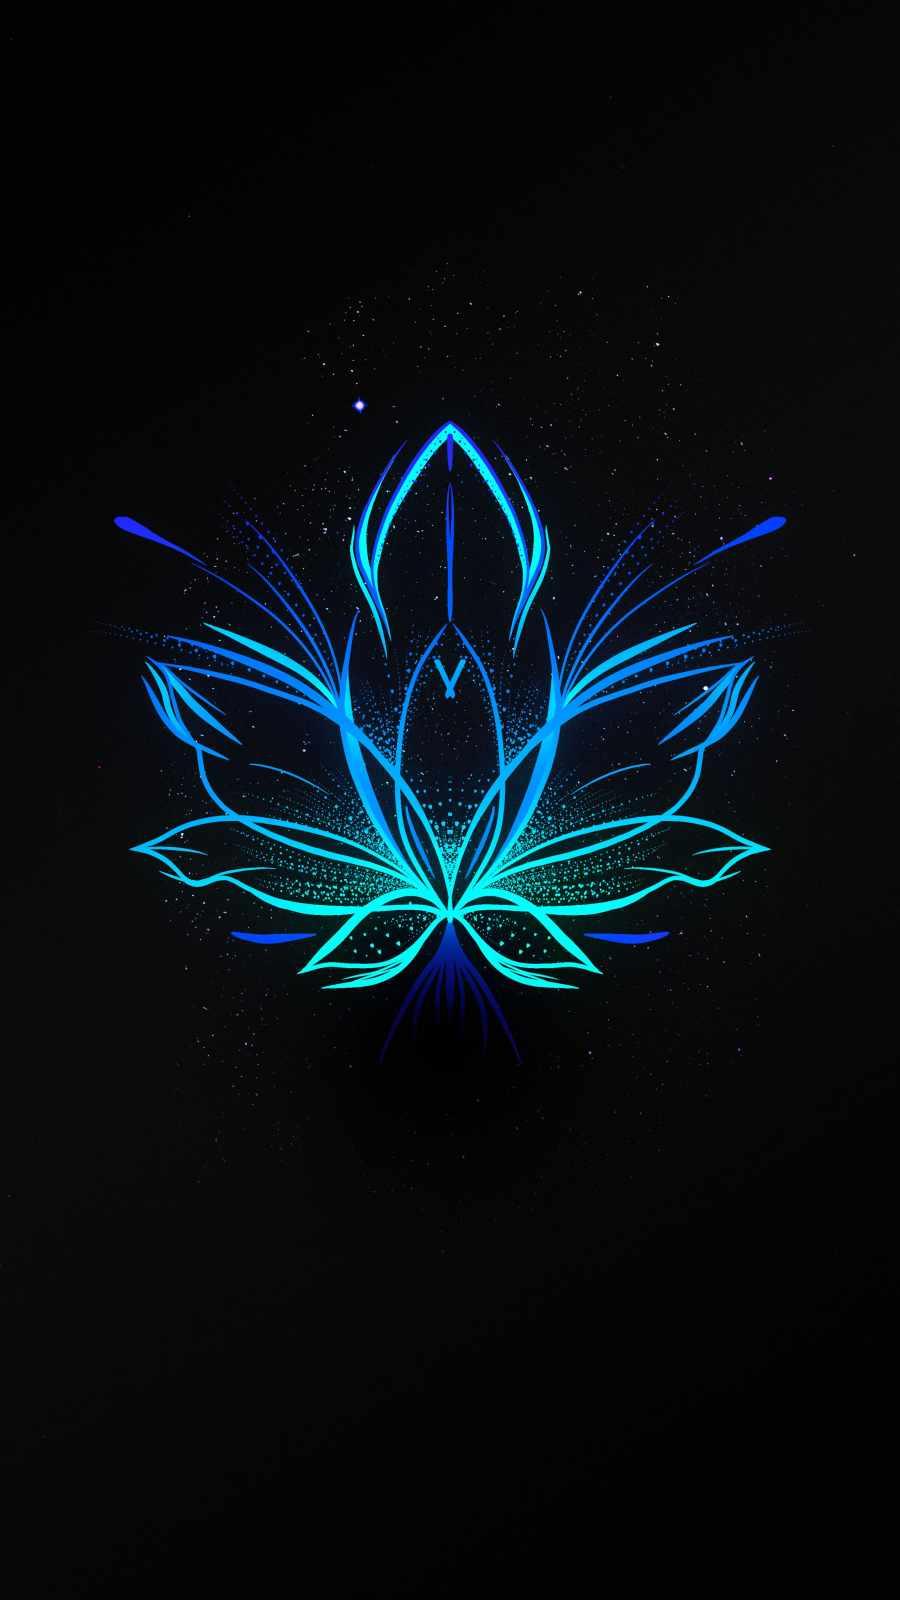 Neon Flower Amoled iPhone Wallpaper